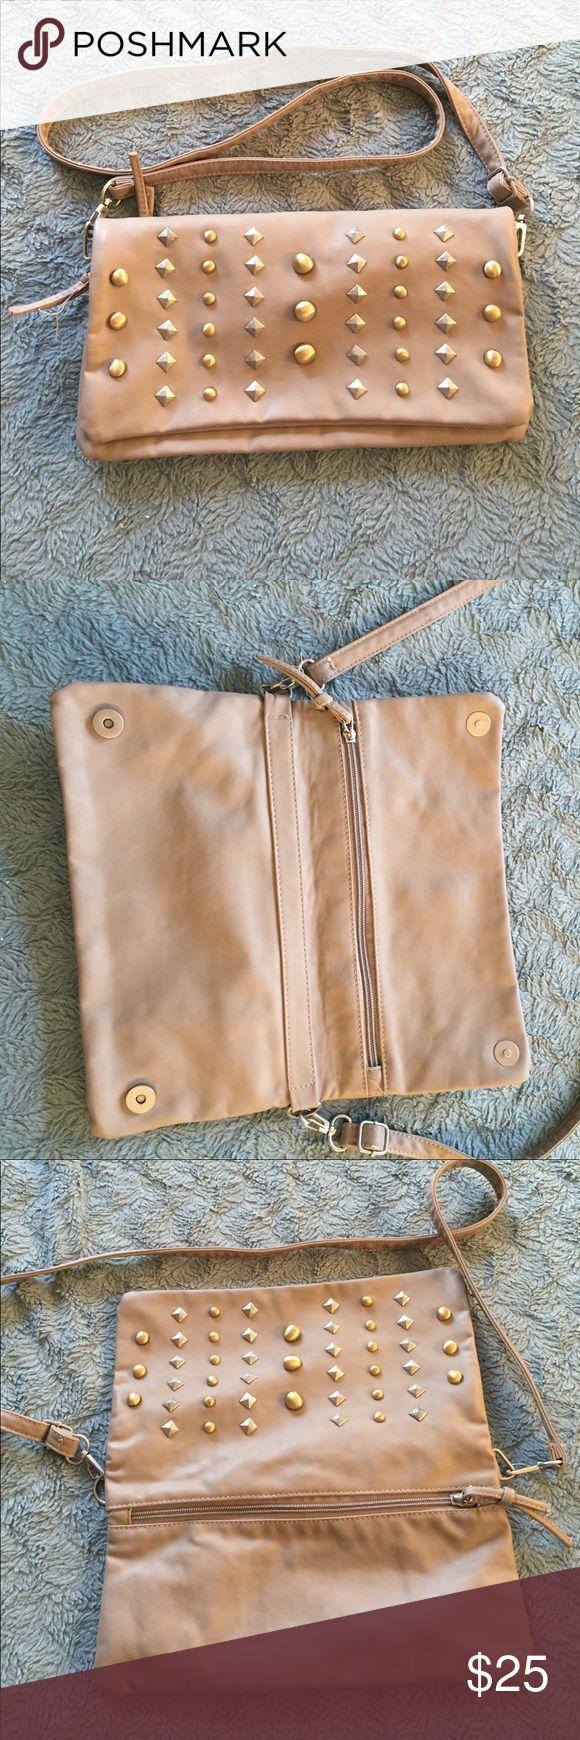 Gorgeous studded clutch purse Gorgeous studded clutch purse Bags Clutches & Wristlets